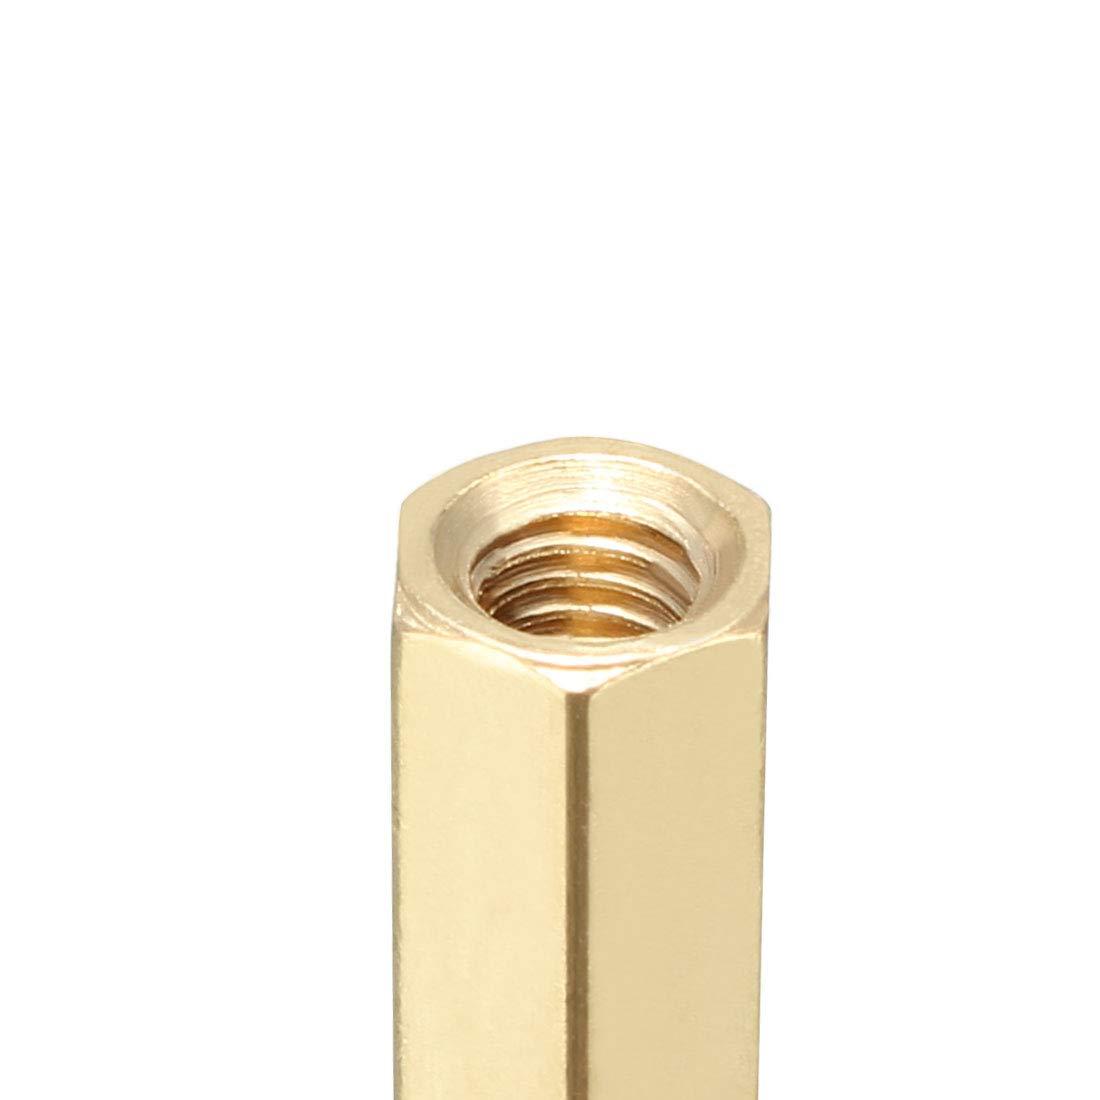 uxcell 10pcs Brass Straight PCB Pillar Female Thread Hex Standoff Spacer M4x6x15mm